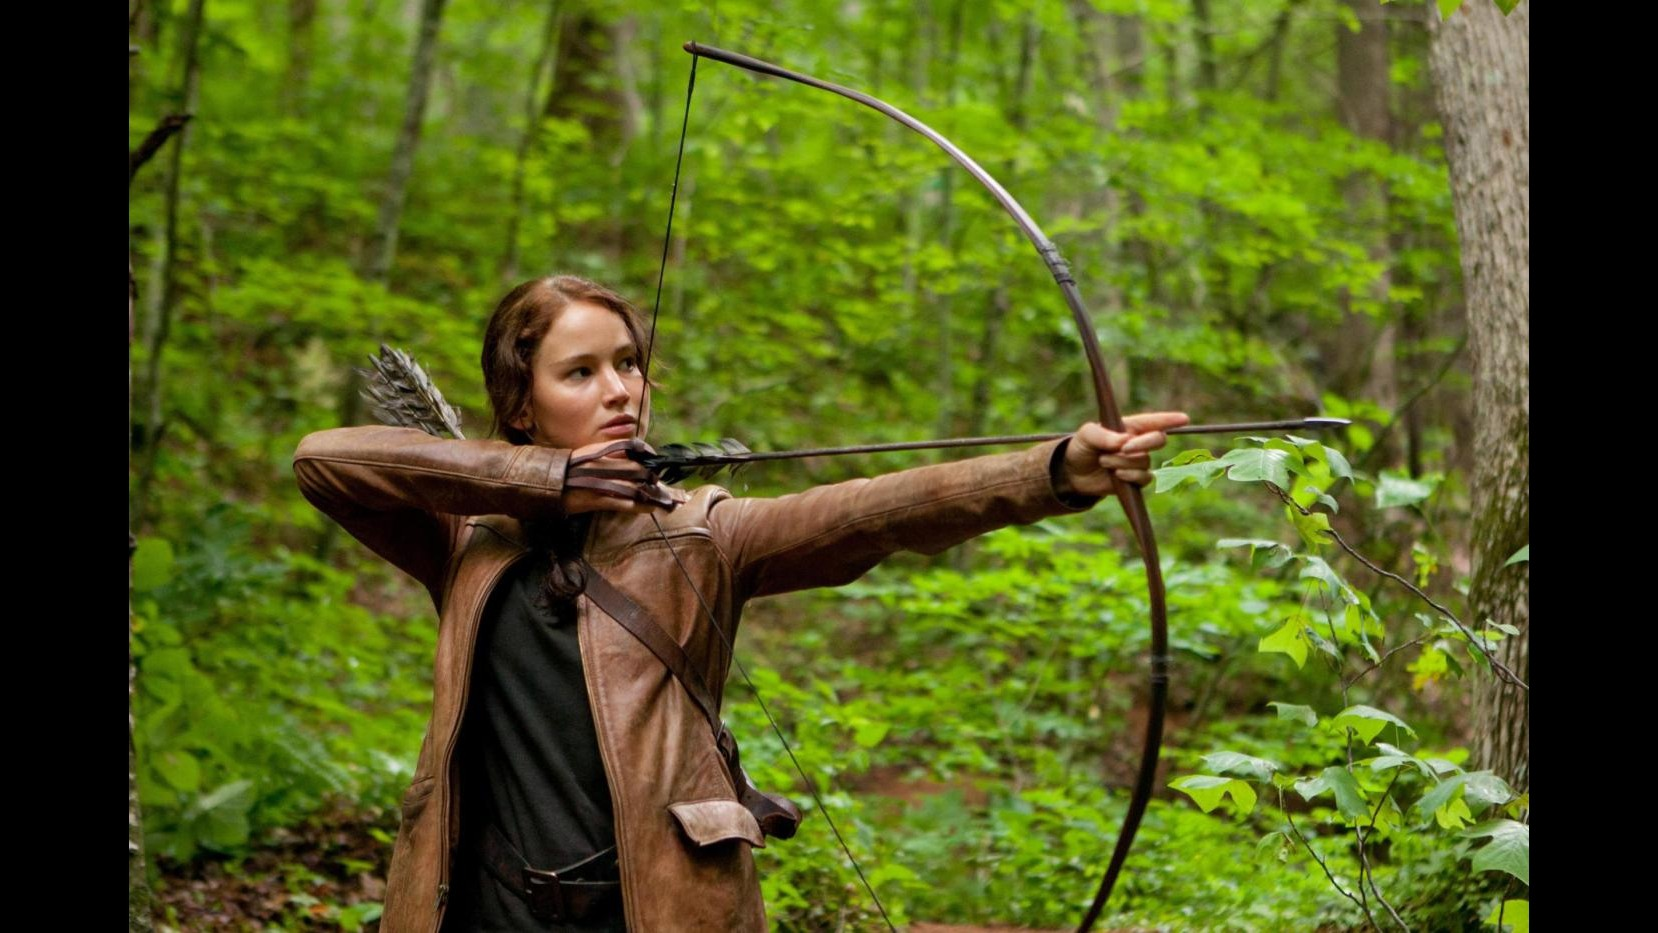 Il film 'Hunger games' trionfa con 5 premi ai People's choice award